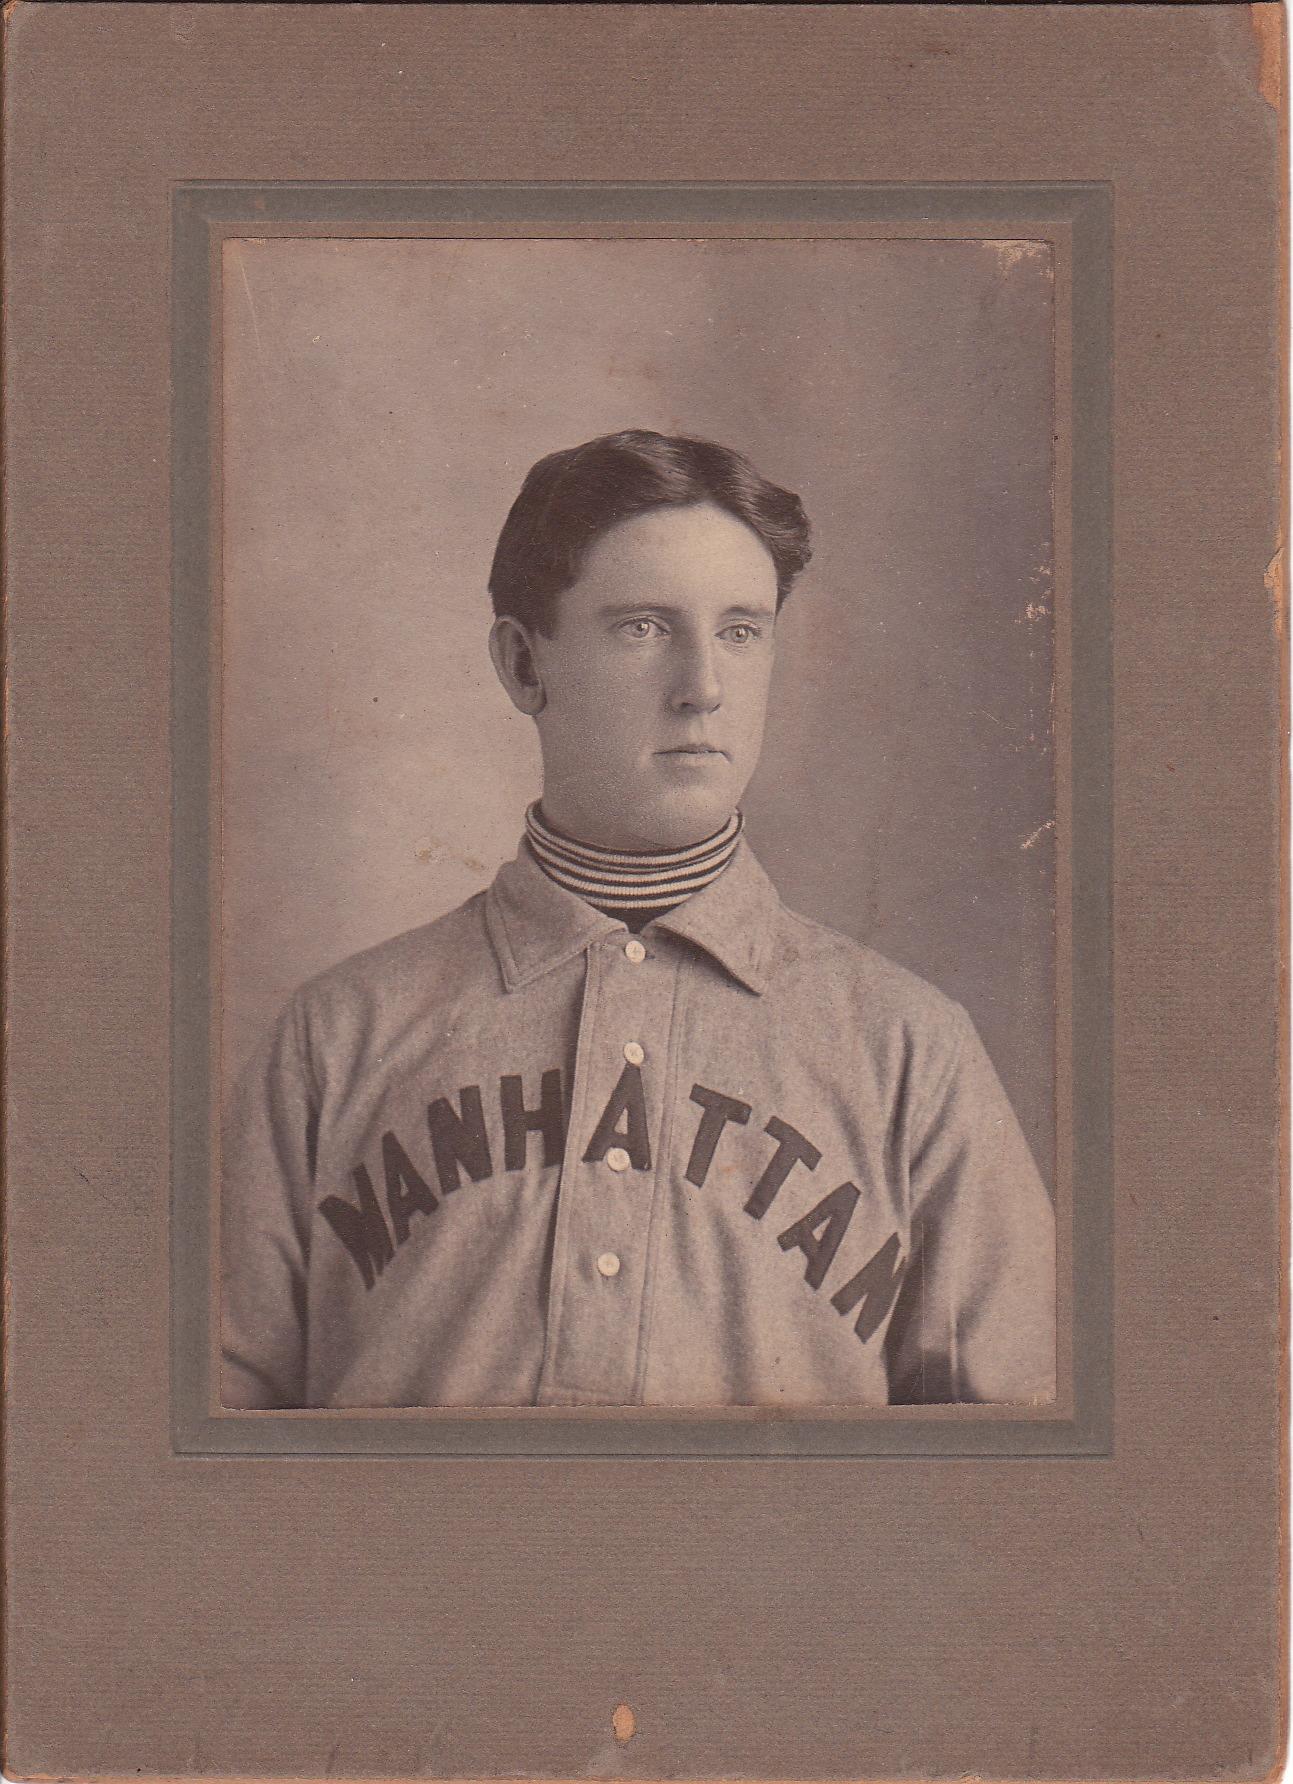 BABE RUTH Baseball Legend Vintage Photograph Autograph Cabinet Card A++